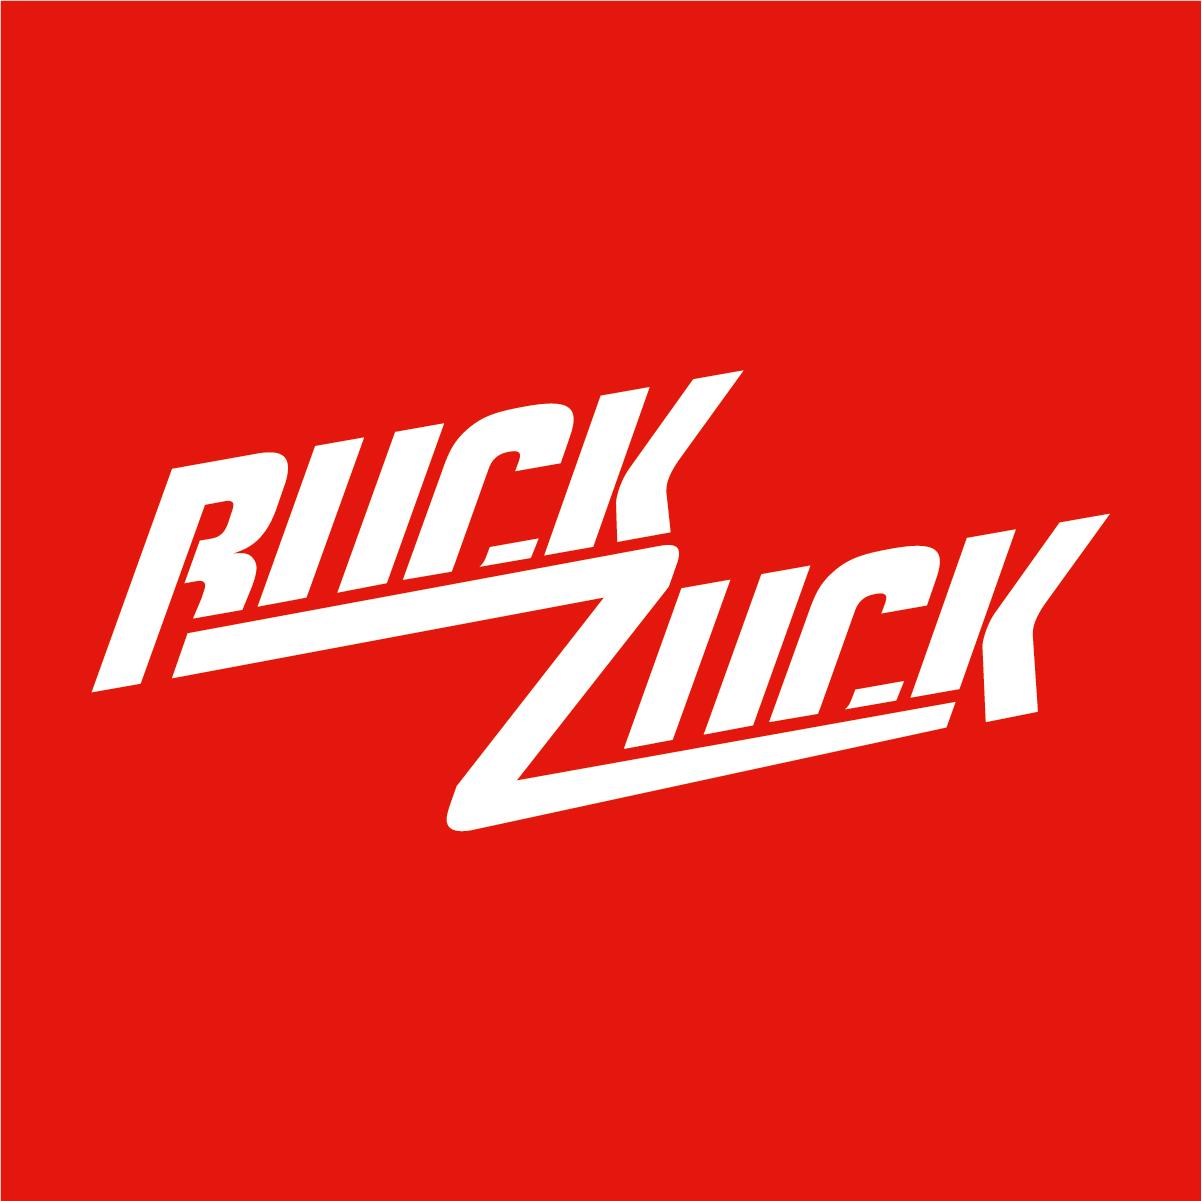 CERAMIN VARIO 3mm Fliese x-tra breit Tadelakt weiss PVC-frei